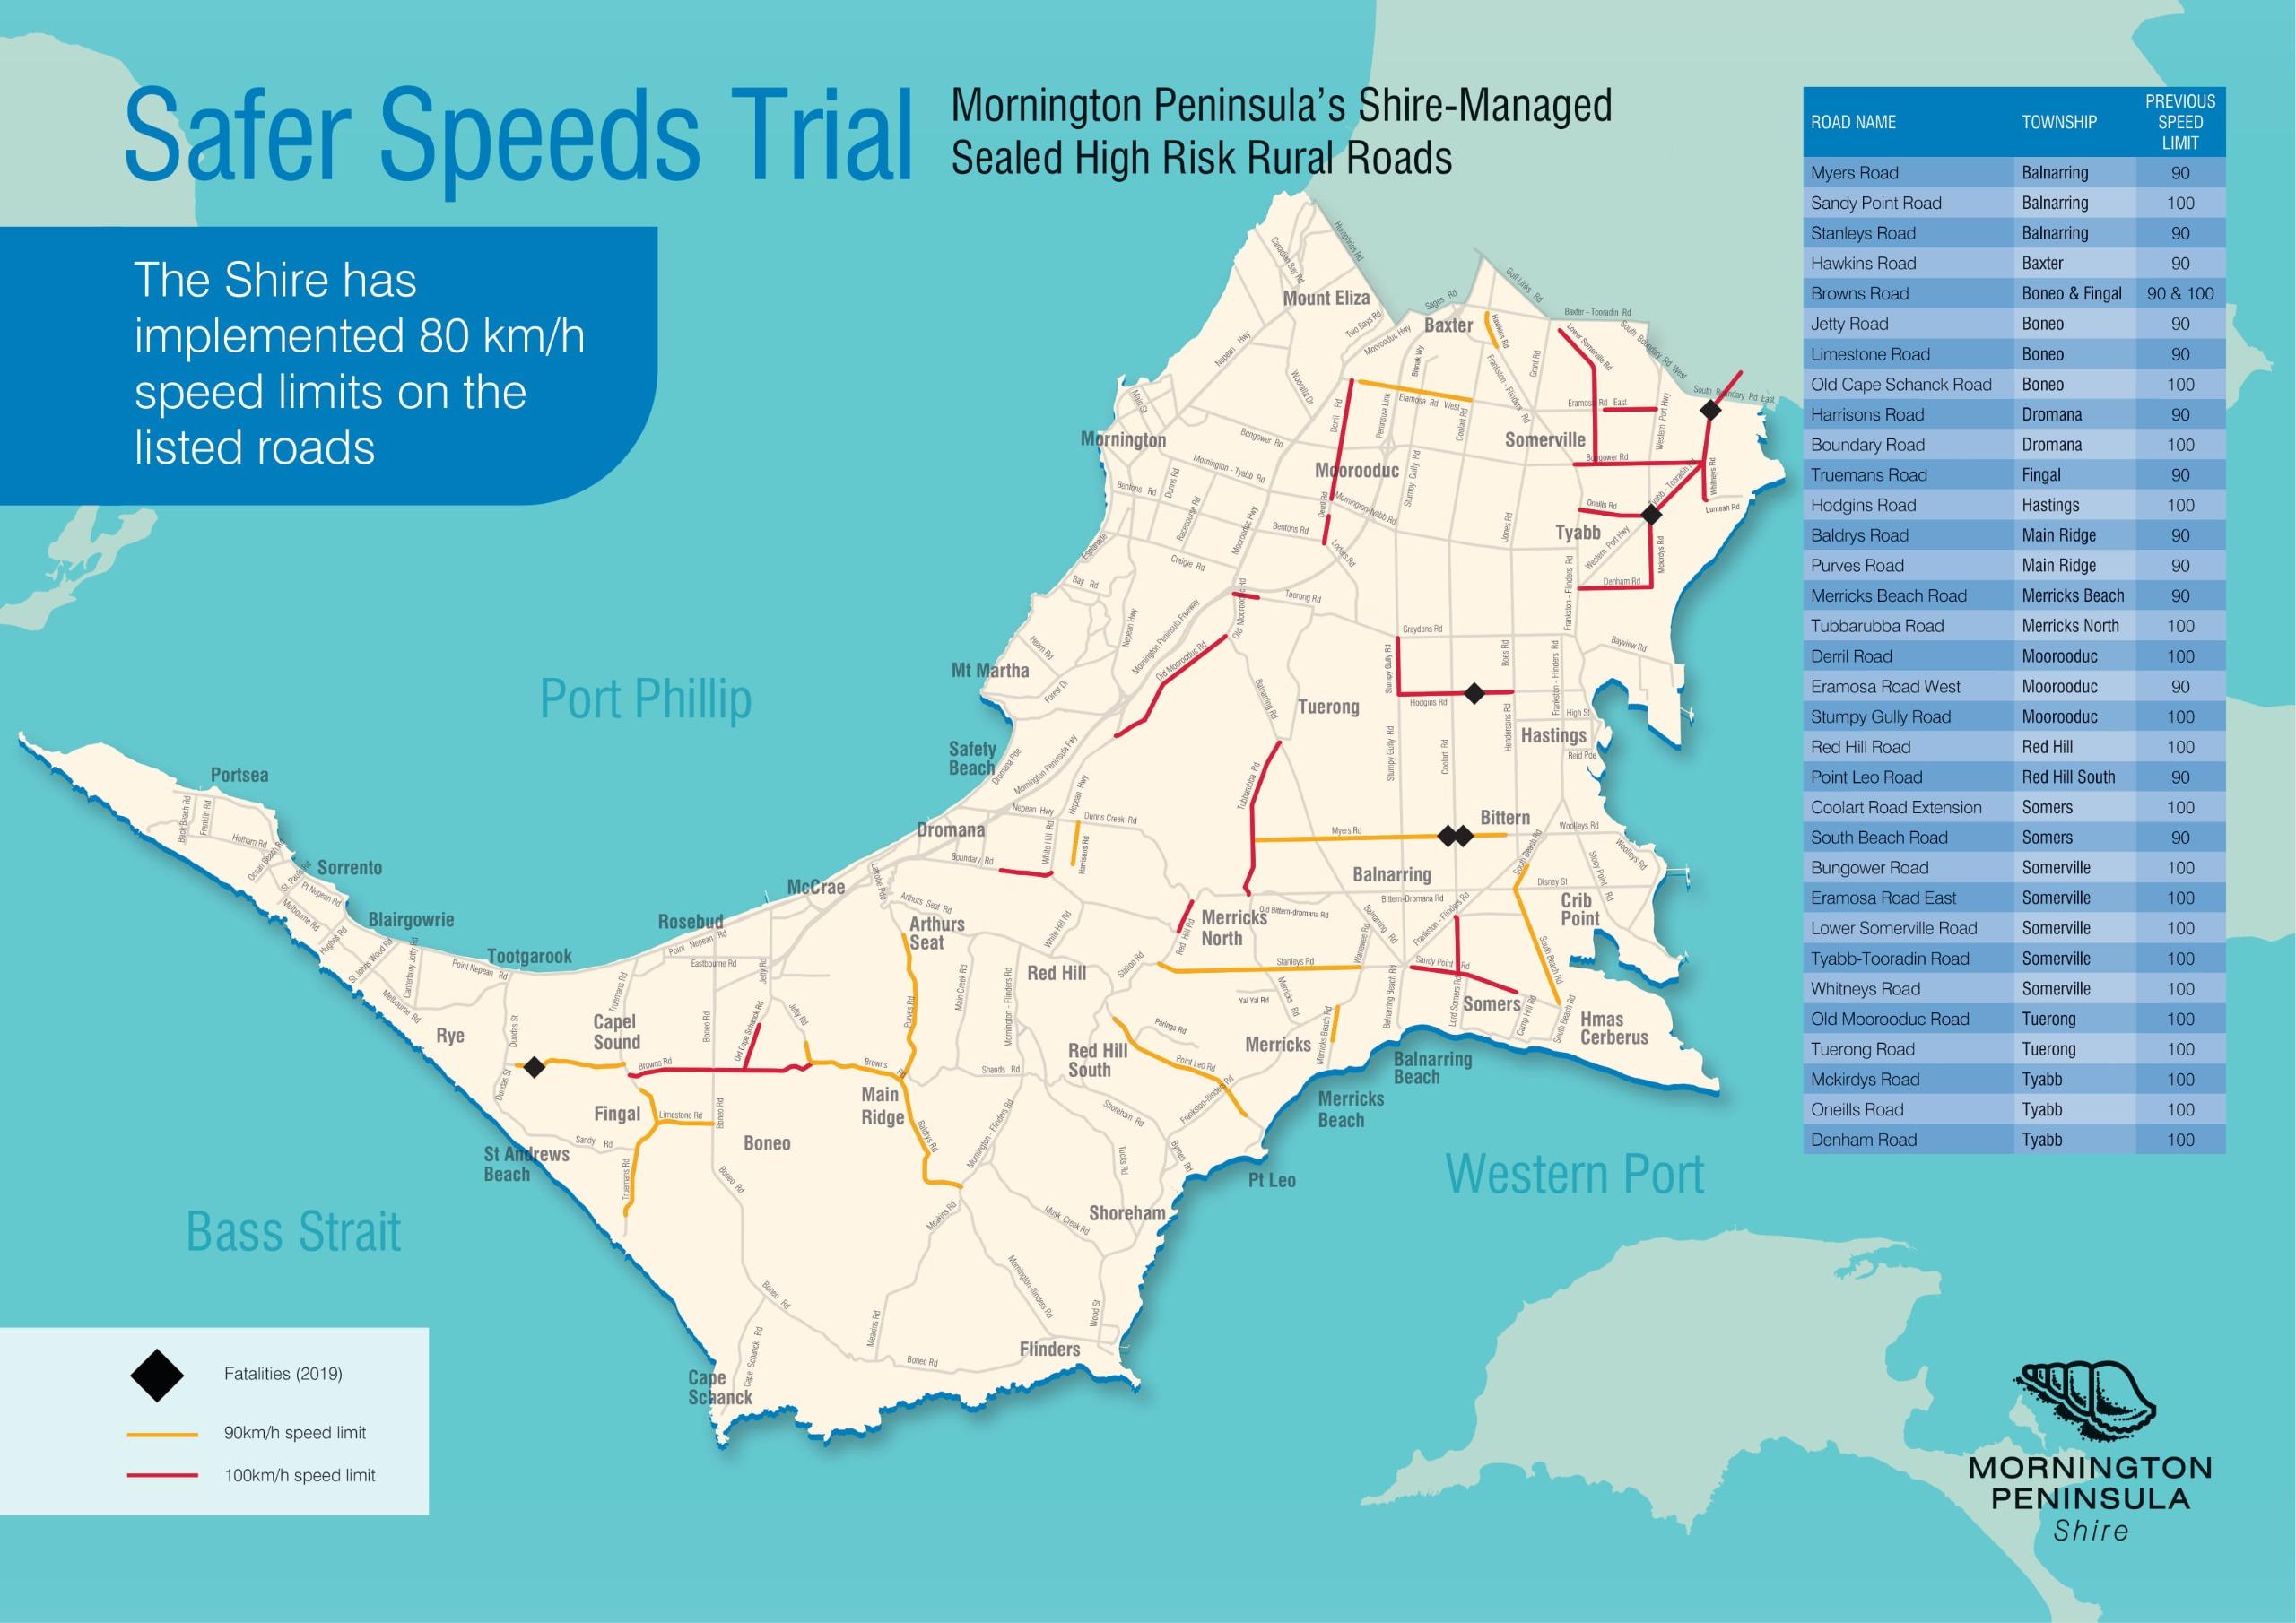 Safer speeds trial map